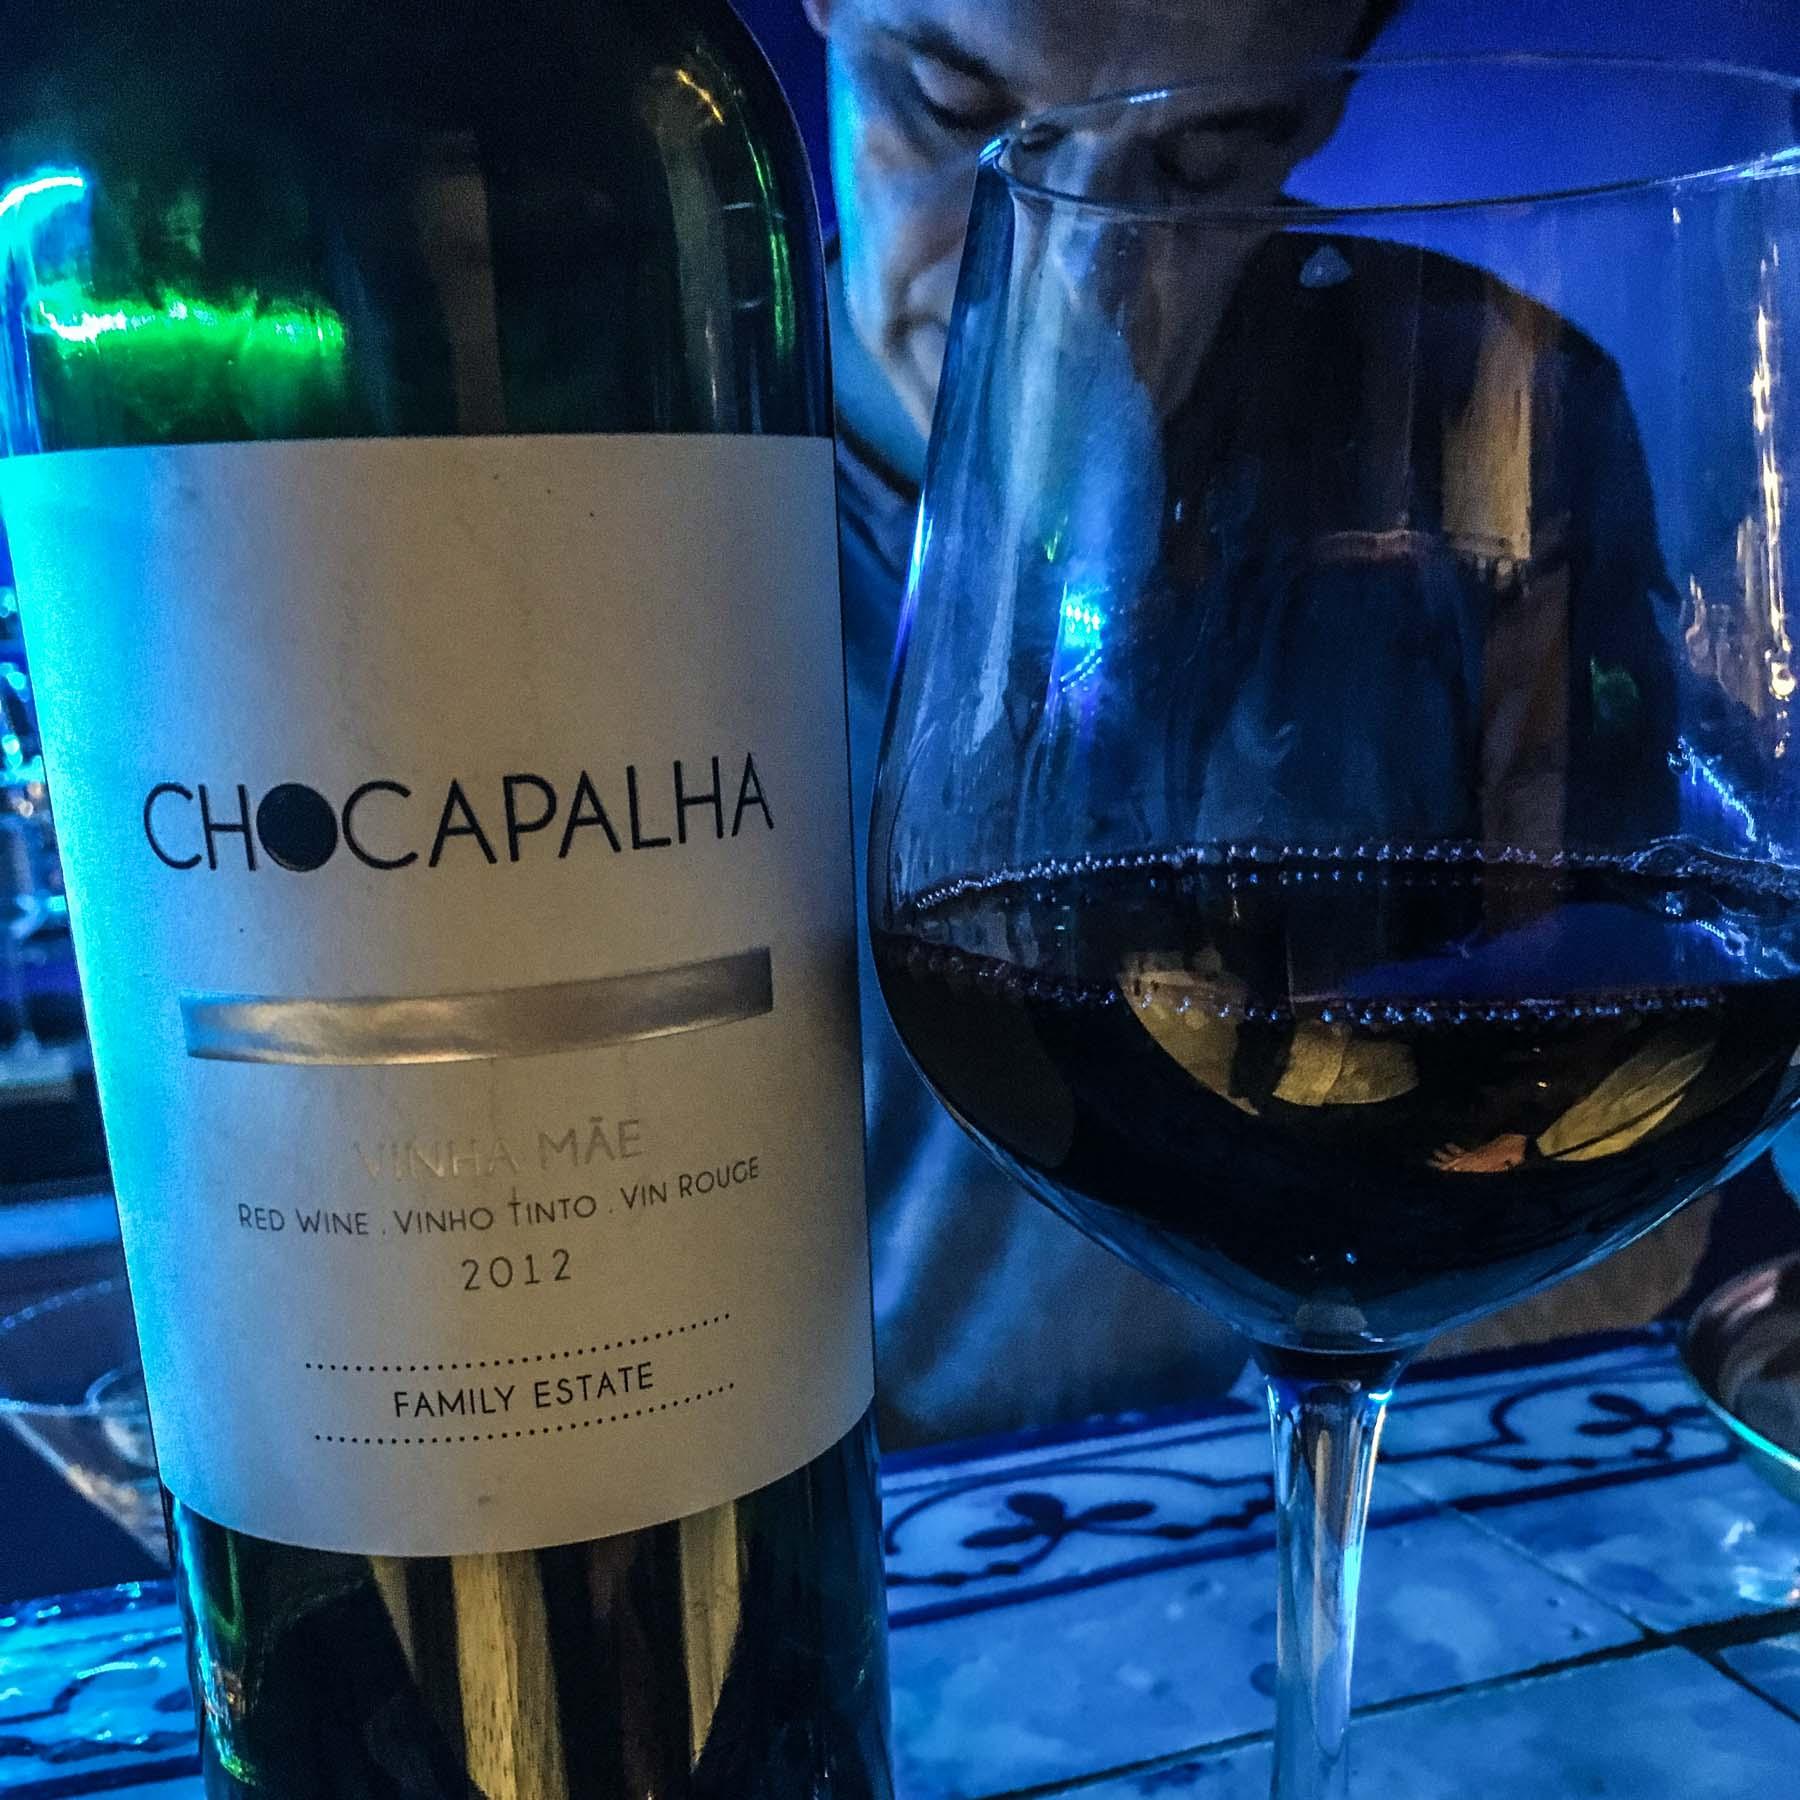 Bottle of red wine in a Lisbon bar.